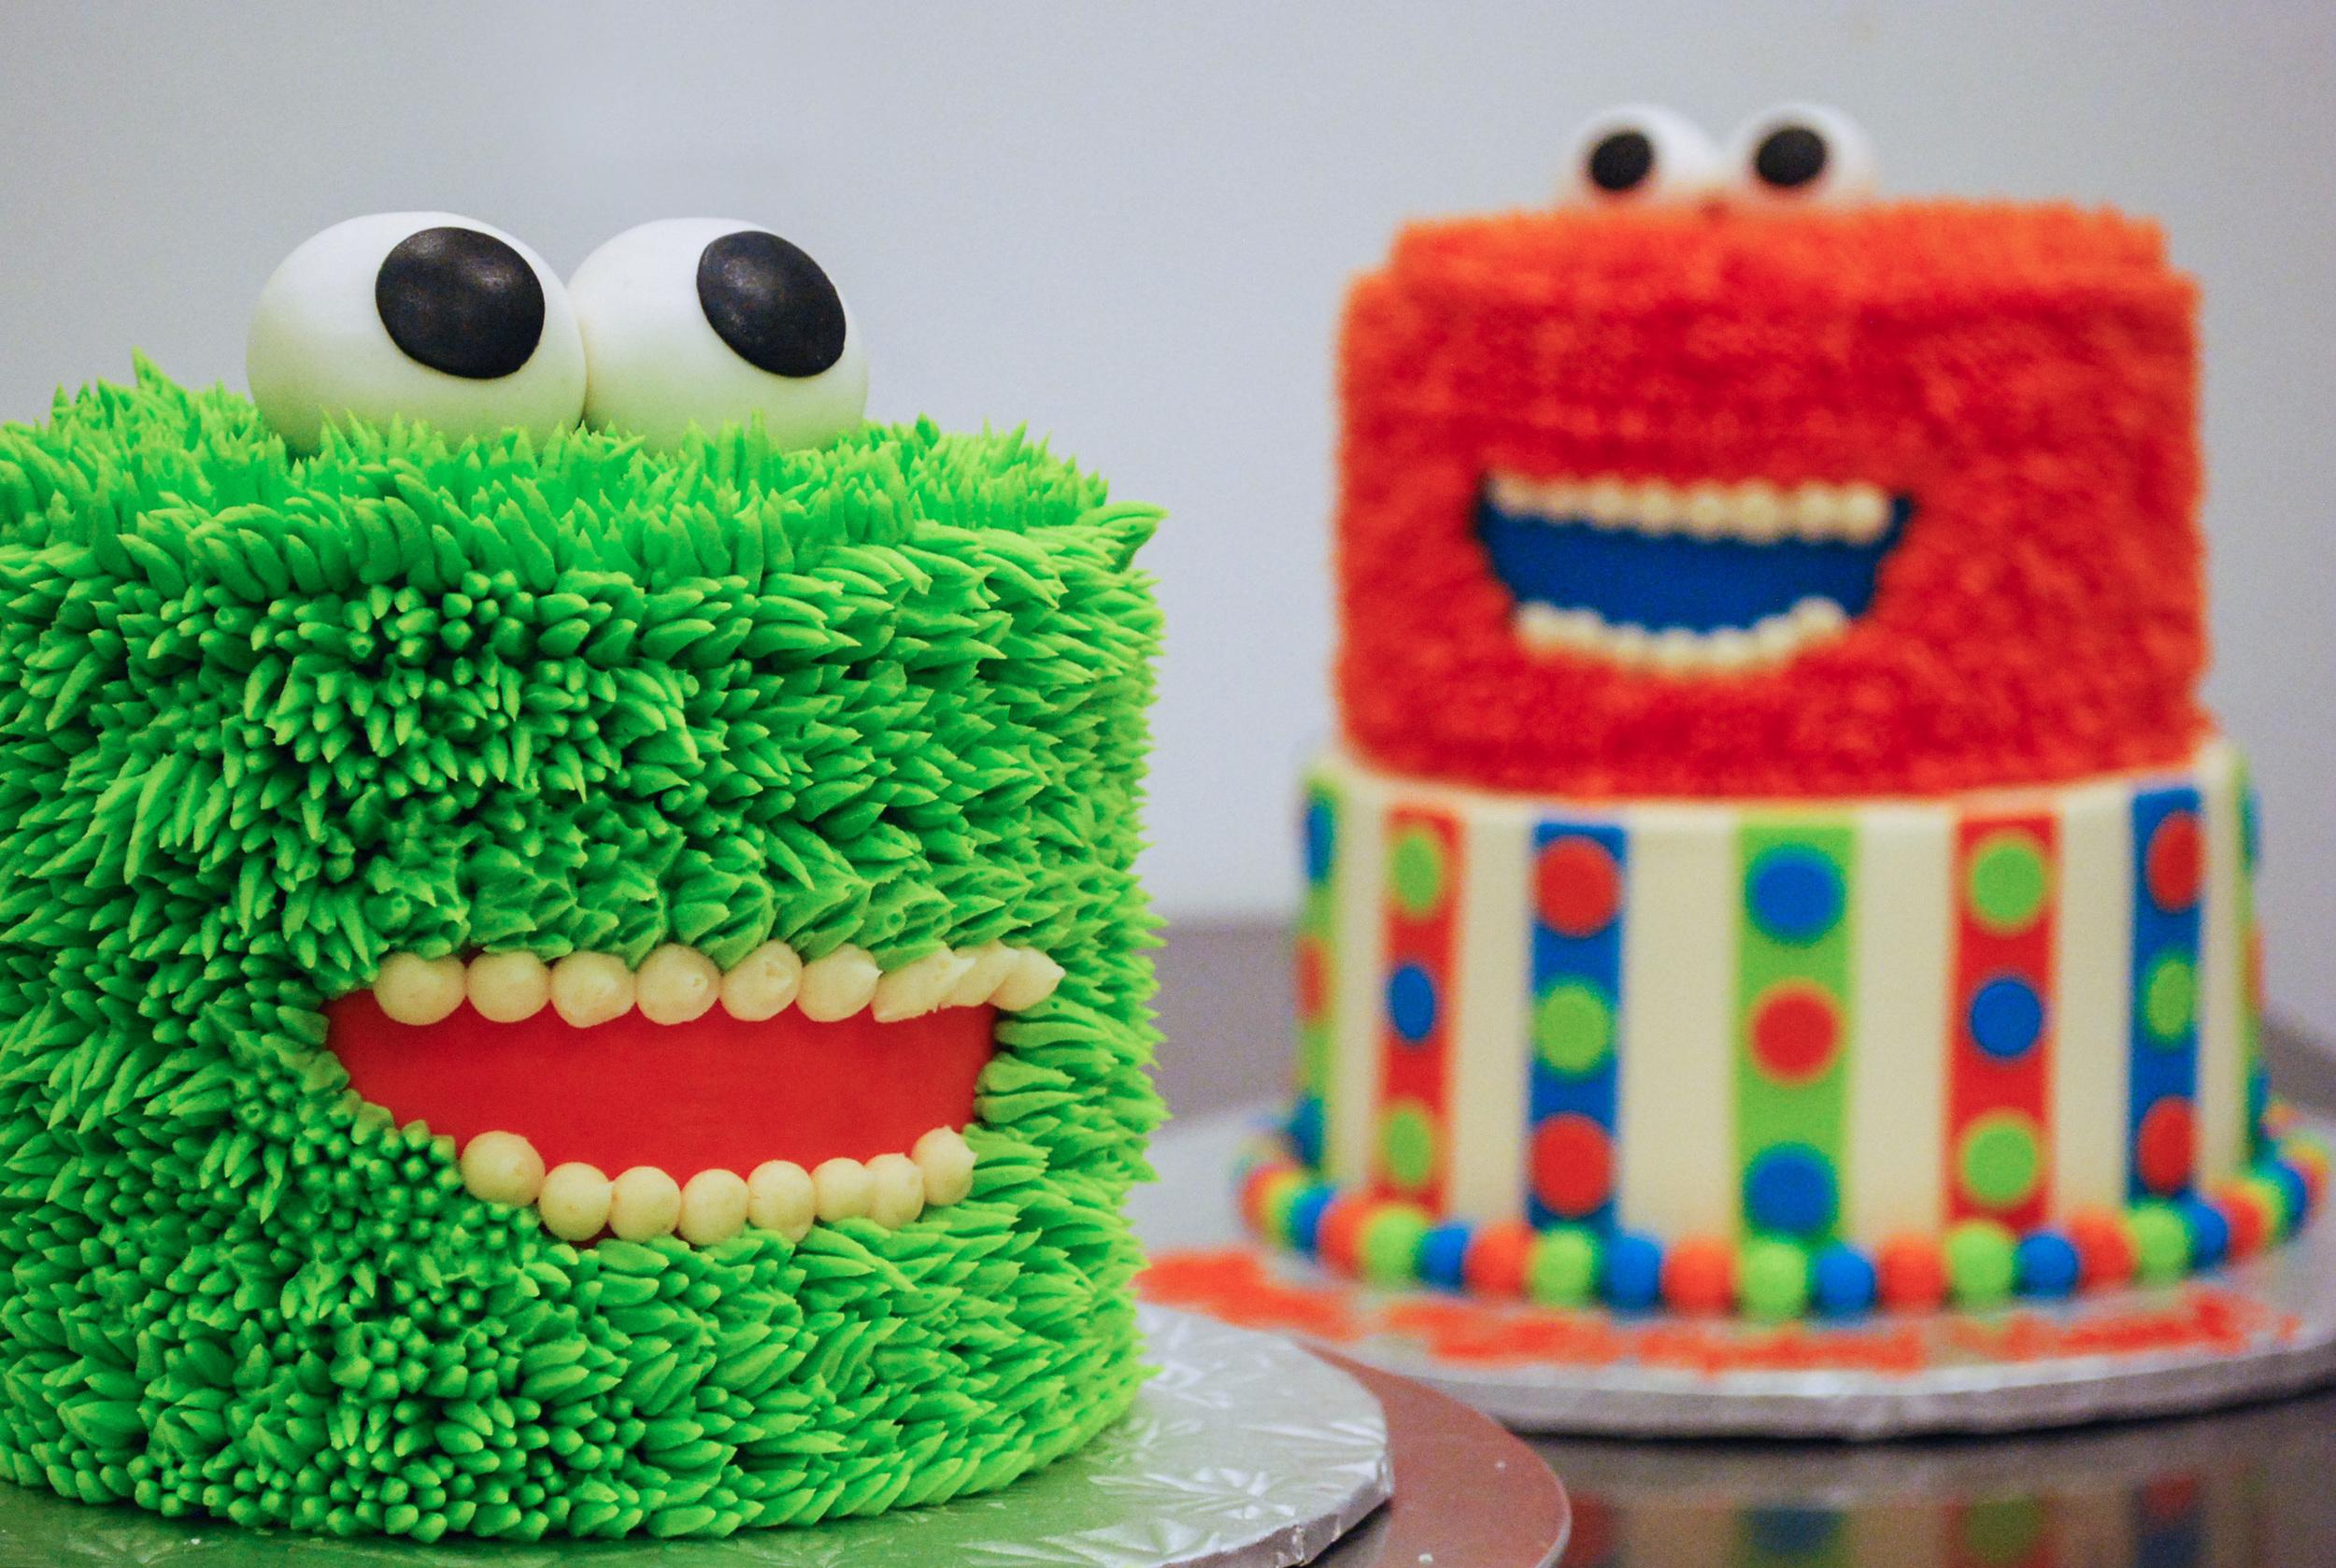 Decorated Cakes_4.jpg